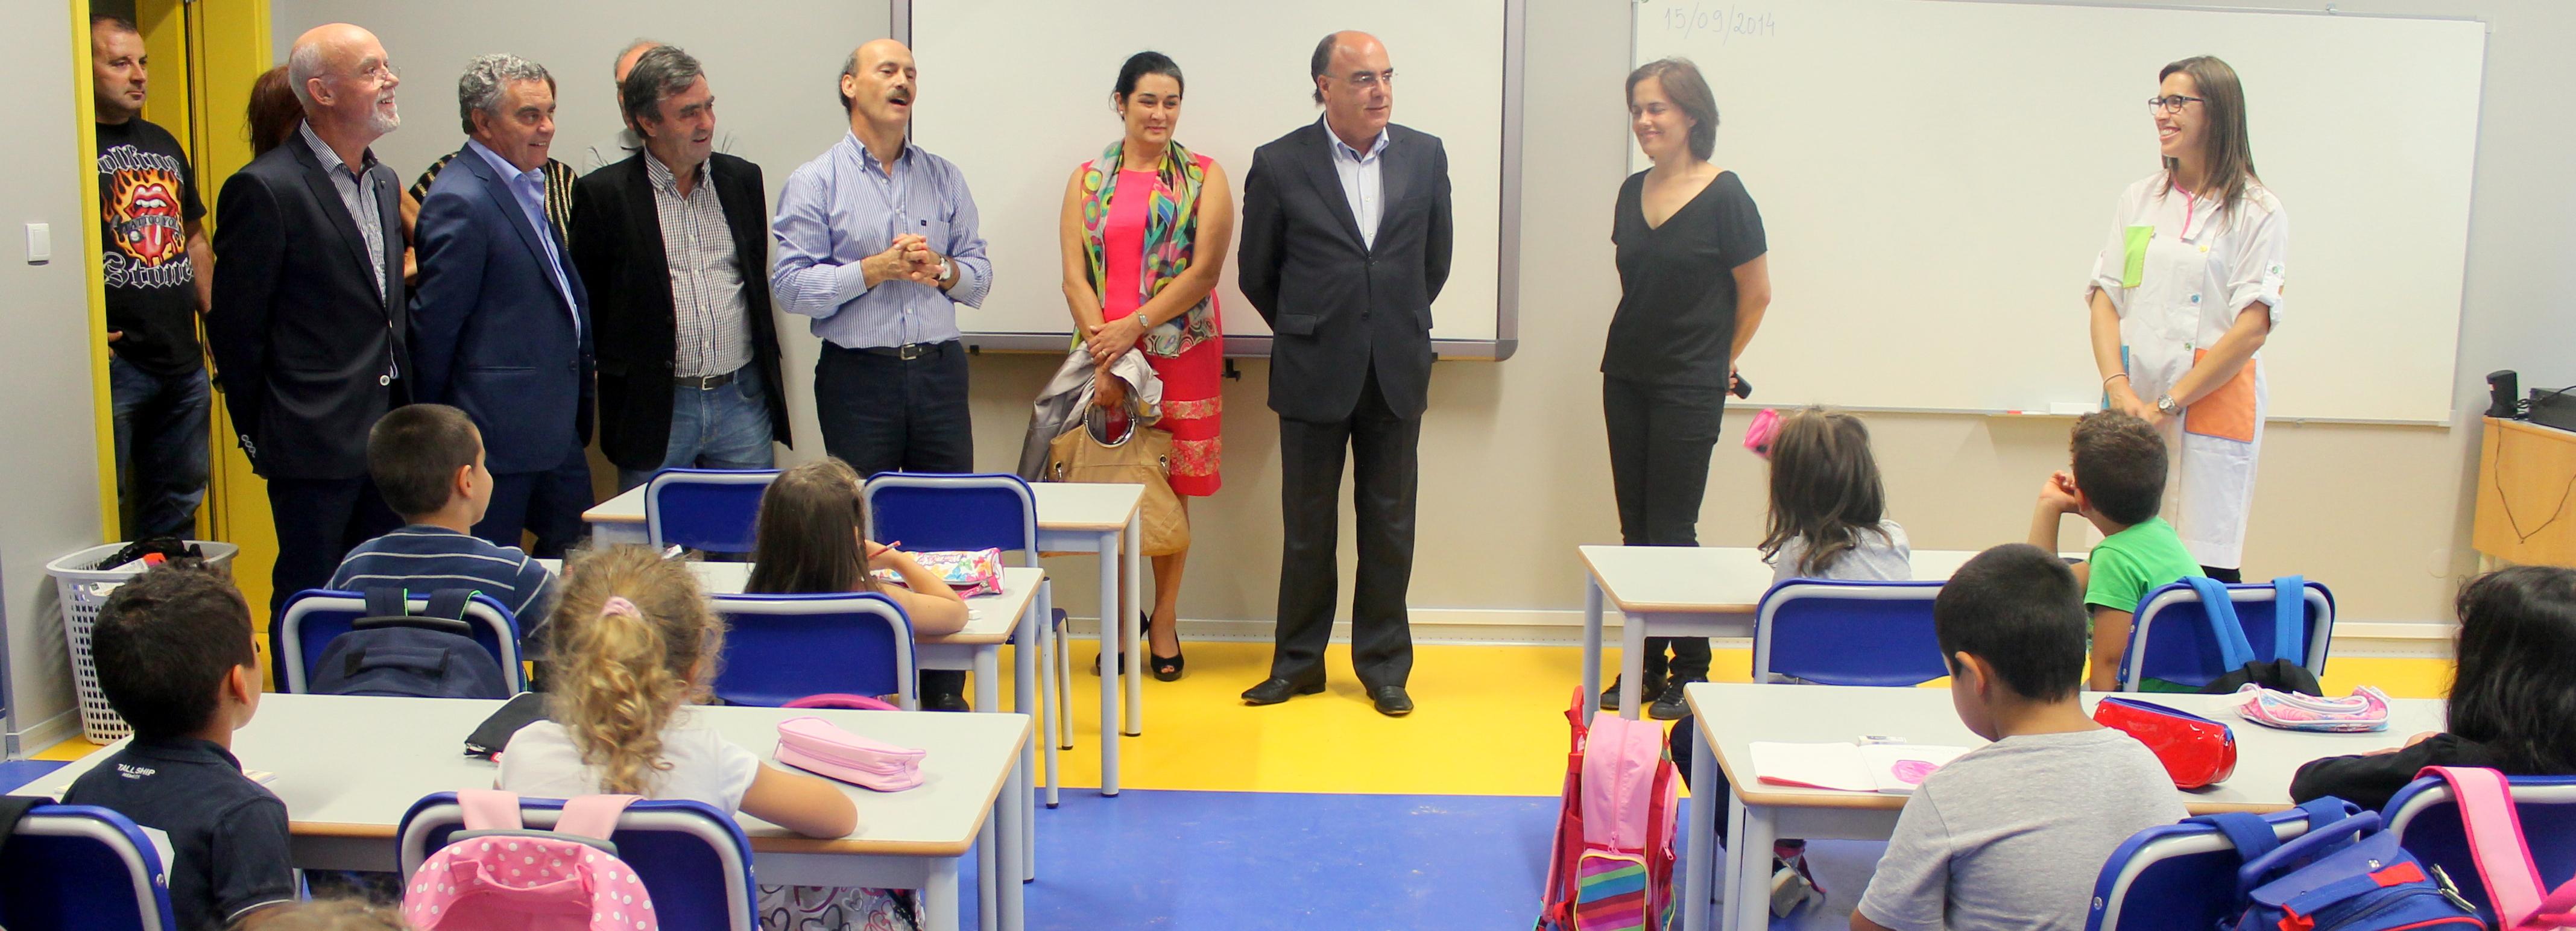 Presidente da Câmara visitou Centro Escolar de Arcozelo marcando o início do novo letivo